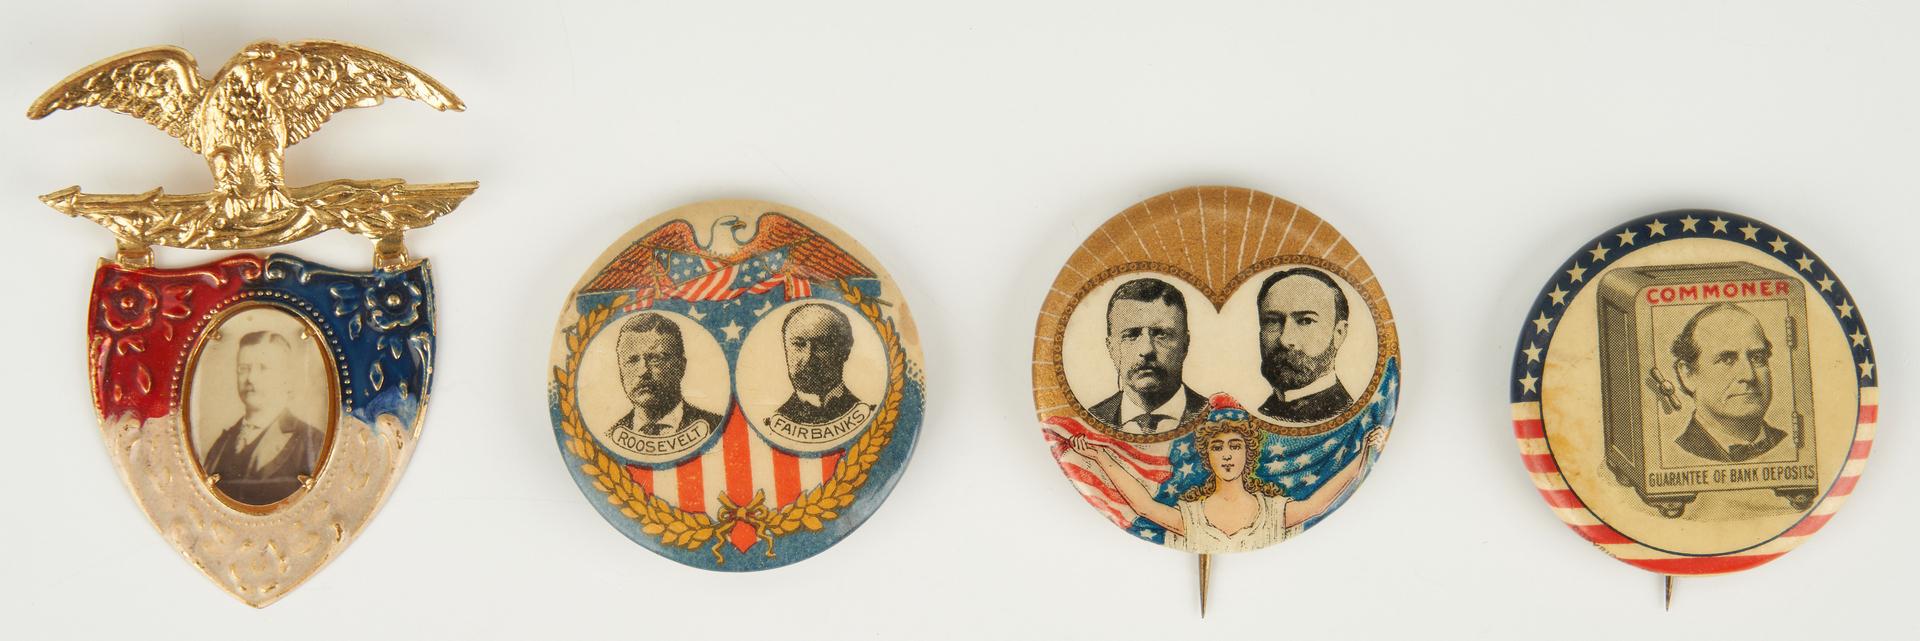 Lot 667: Presidential Campaign Ephemera Items, incl. Bryan, McKinley, T. Roosevelt